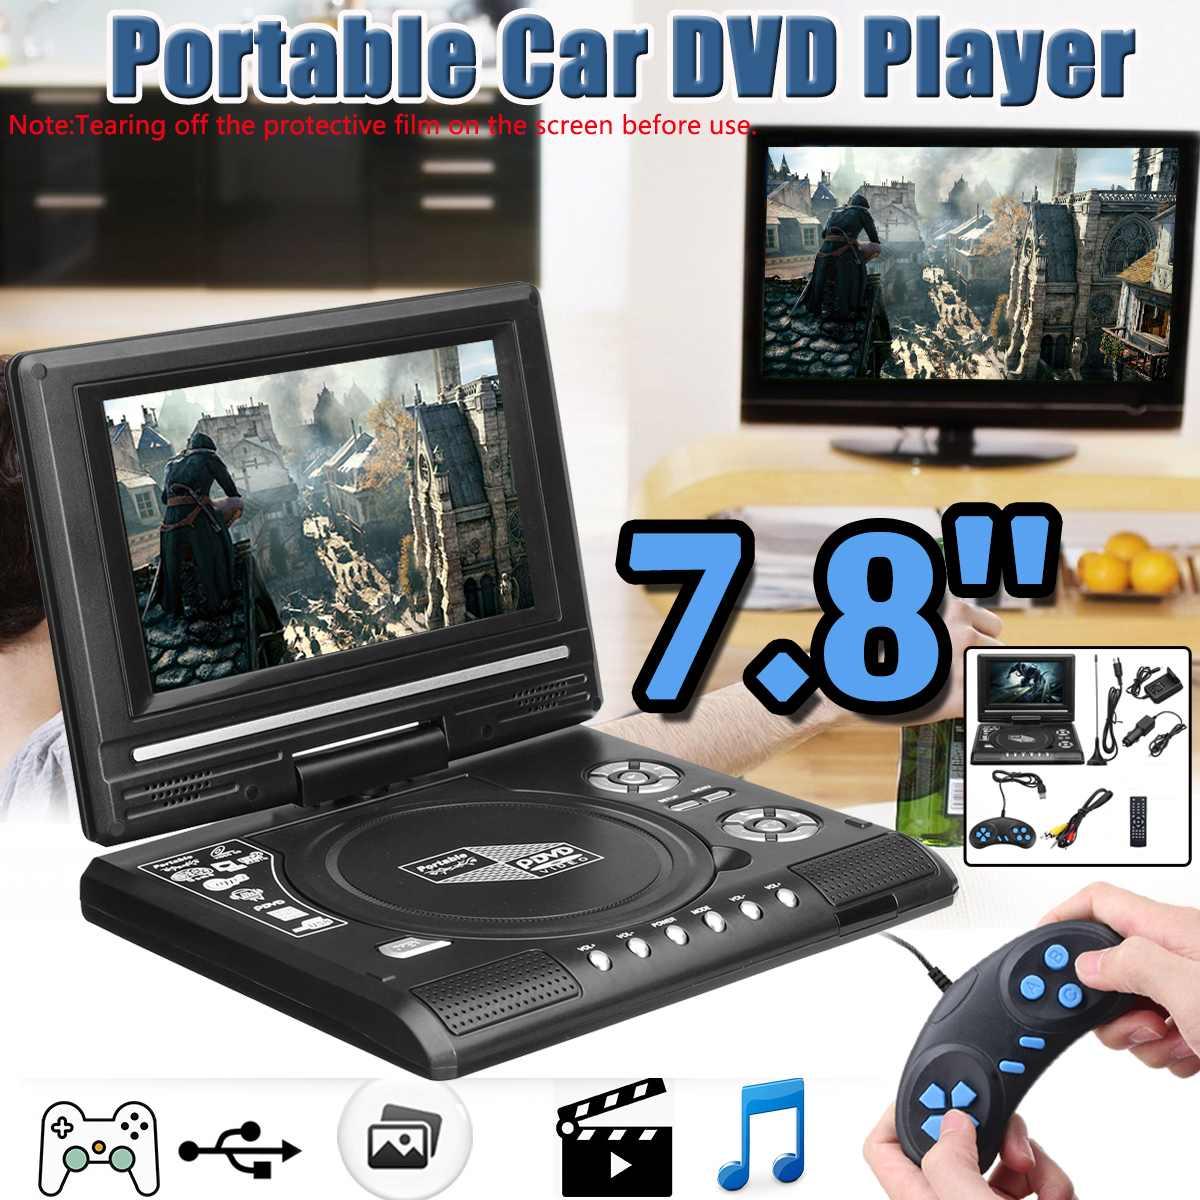 Portátil de 7,8 pulgadas HD TV casa coche reproductor de DVD VCD CD MP3 DVD USB SD reproductor de tarjetas RCA TV Portatil juego de Cable 16:9 pantalla LCD giratoria